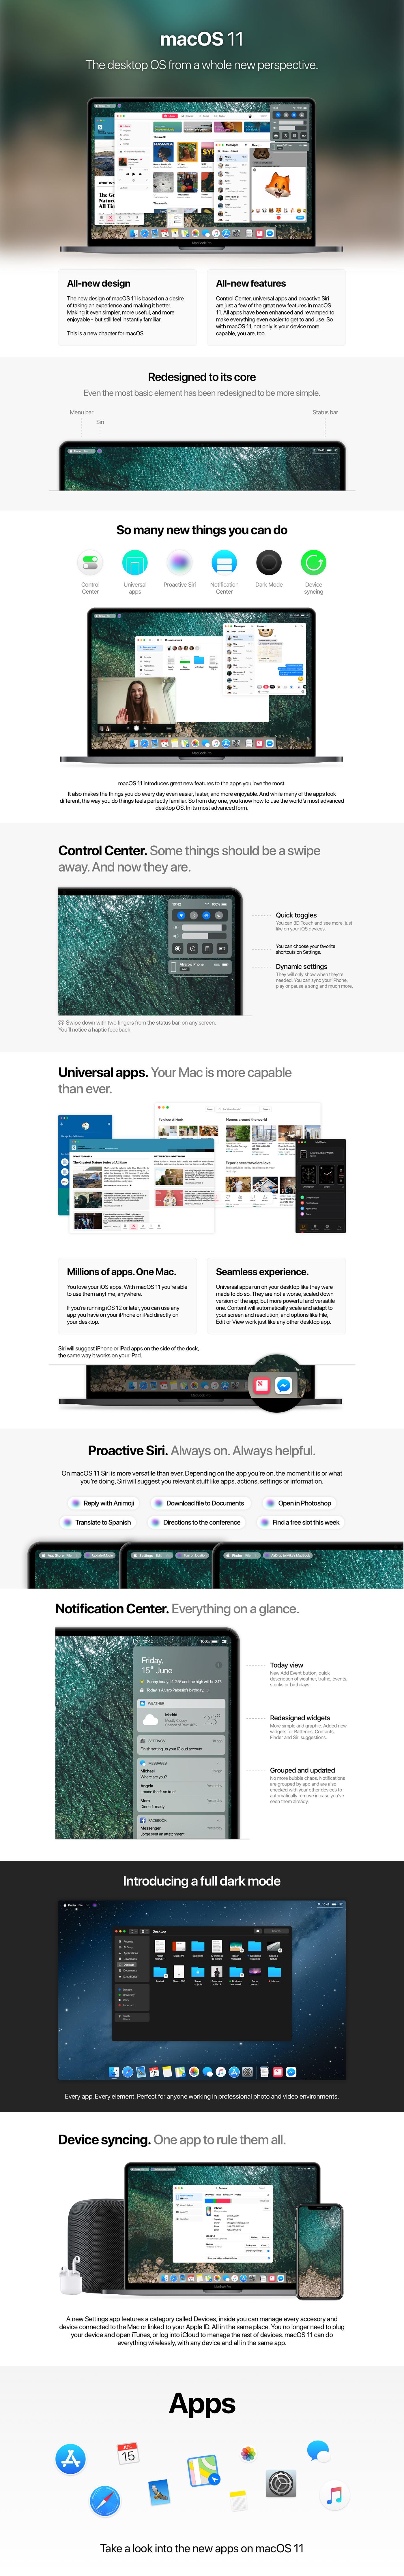 macOS 11 concept Apple